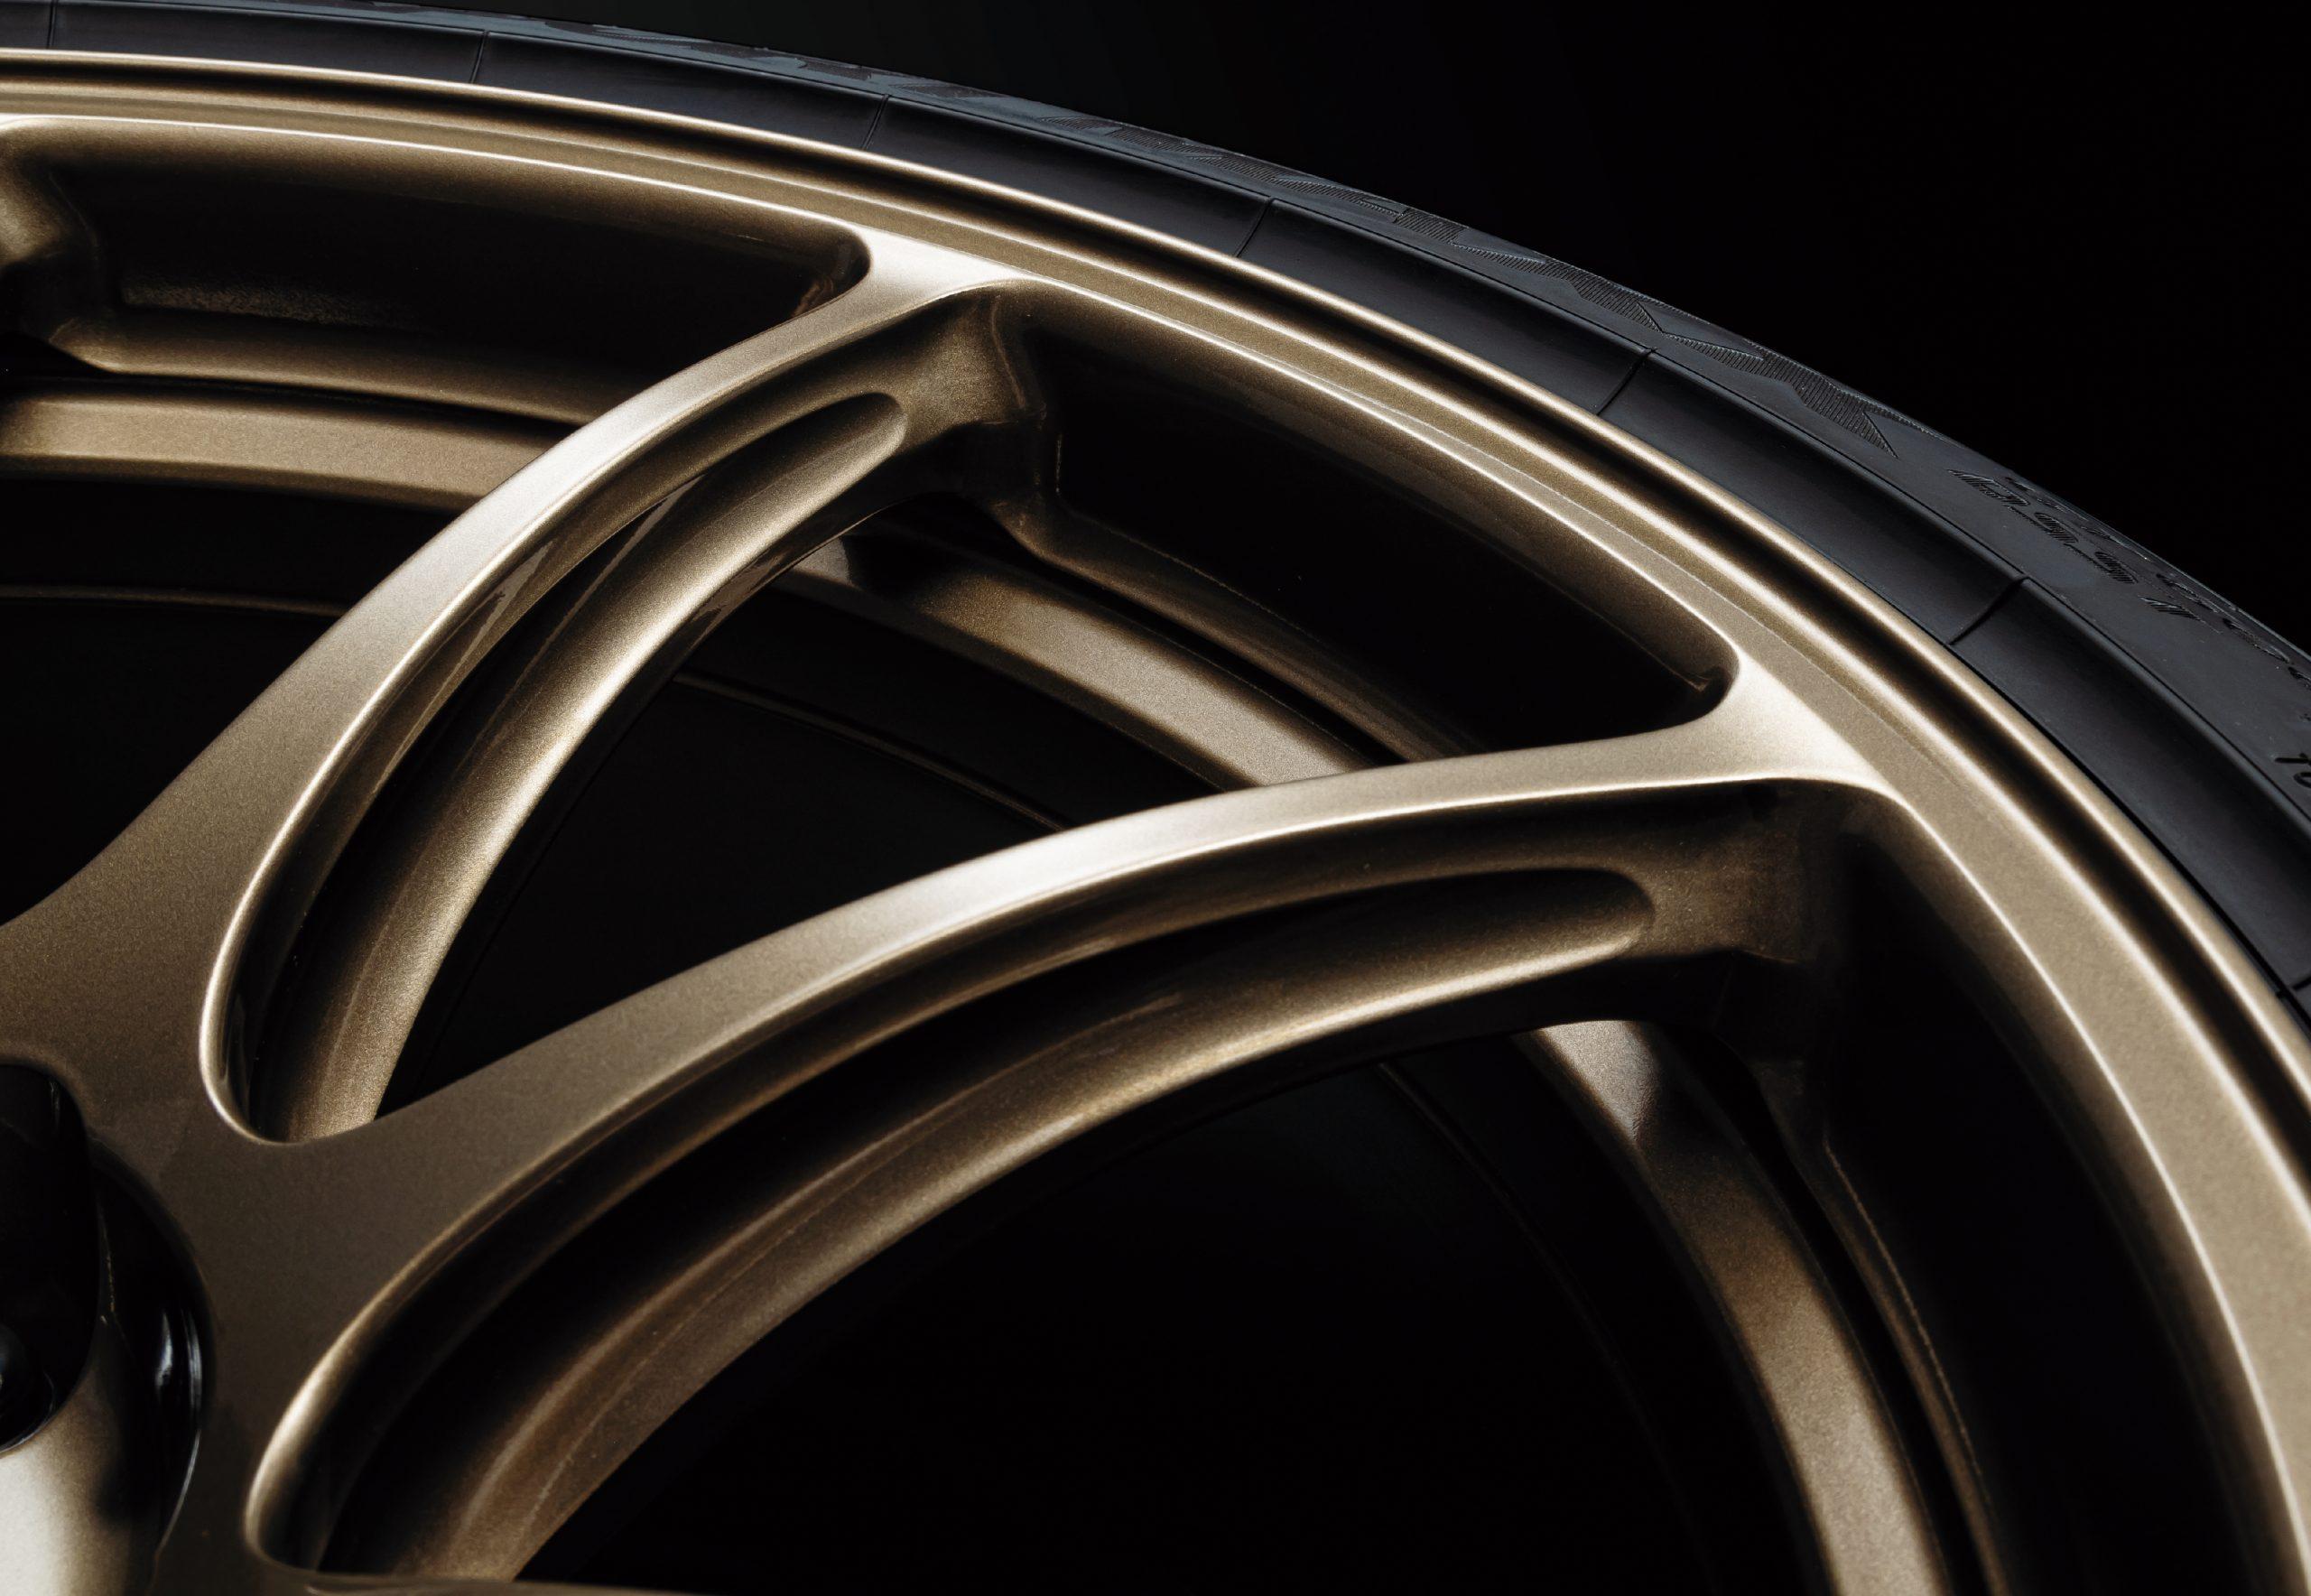 2022 Nissan GT-R Premium T-Spec bronze wheels